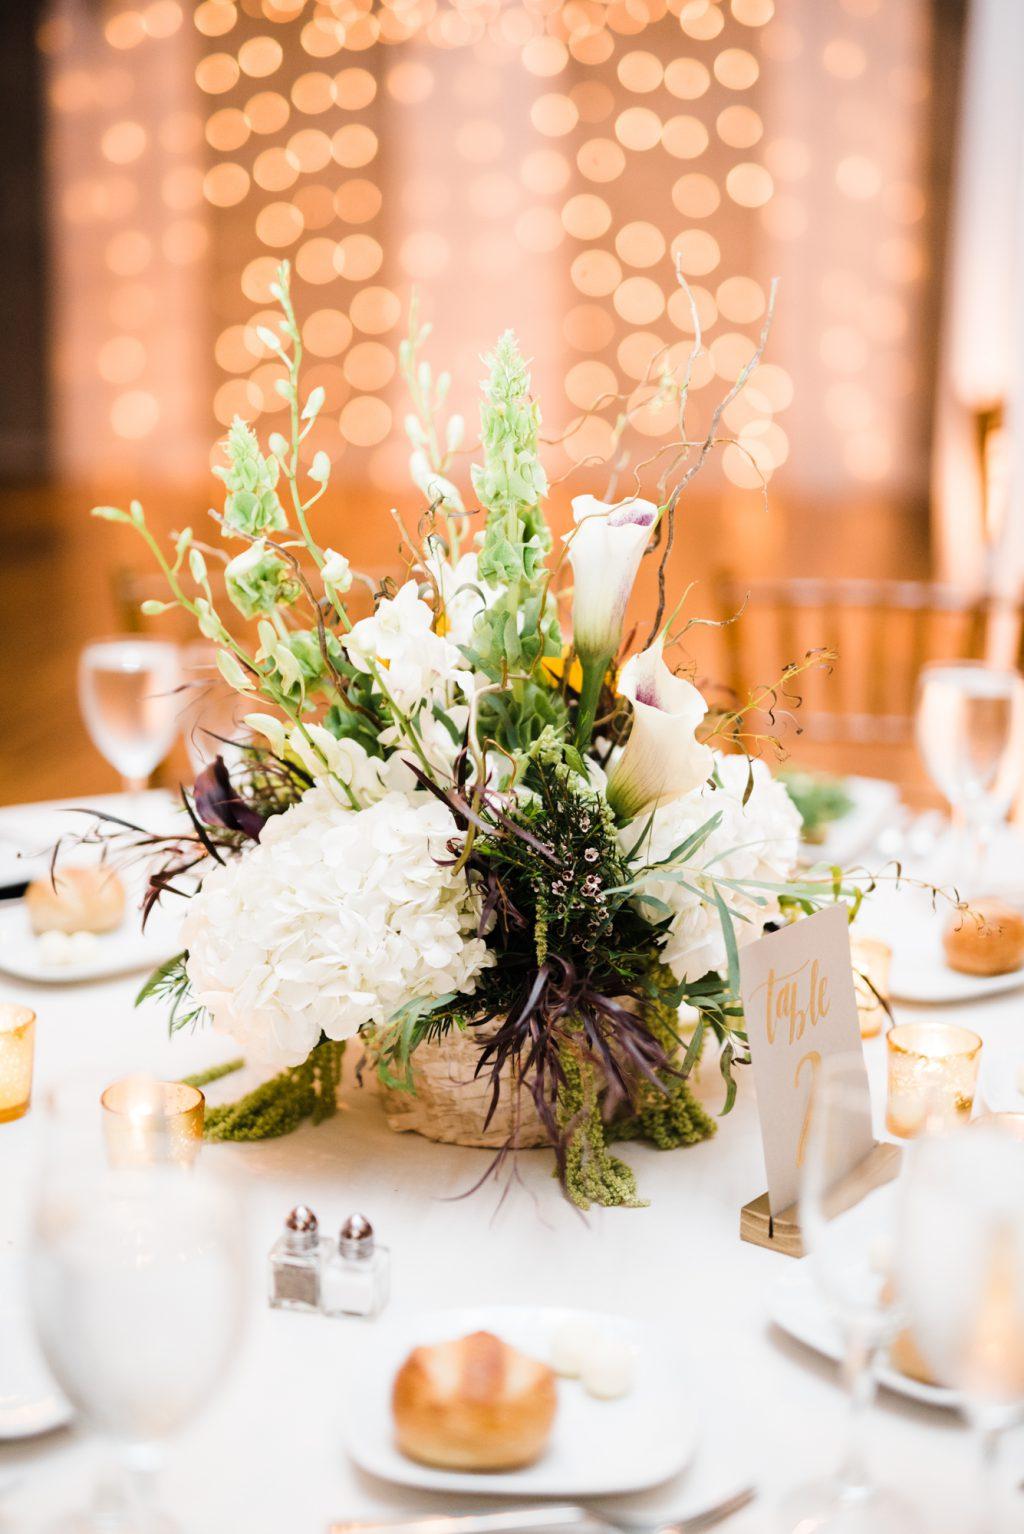 haleyrichterphoto-front-and-palmer-spring-wedding-rodin-museum-loews-hotel-philadelphia-157